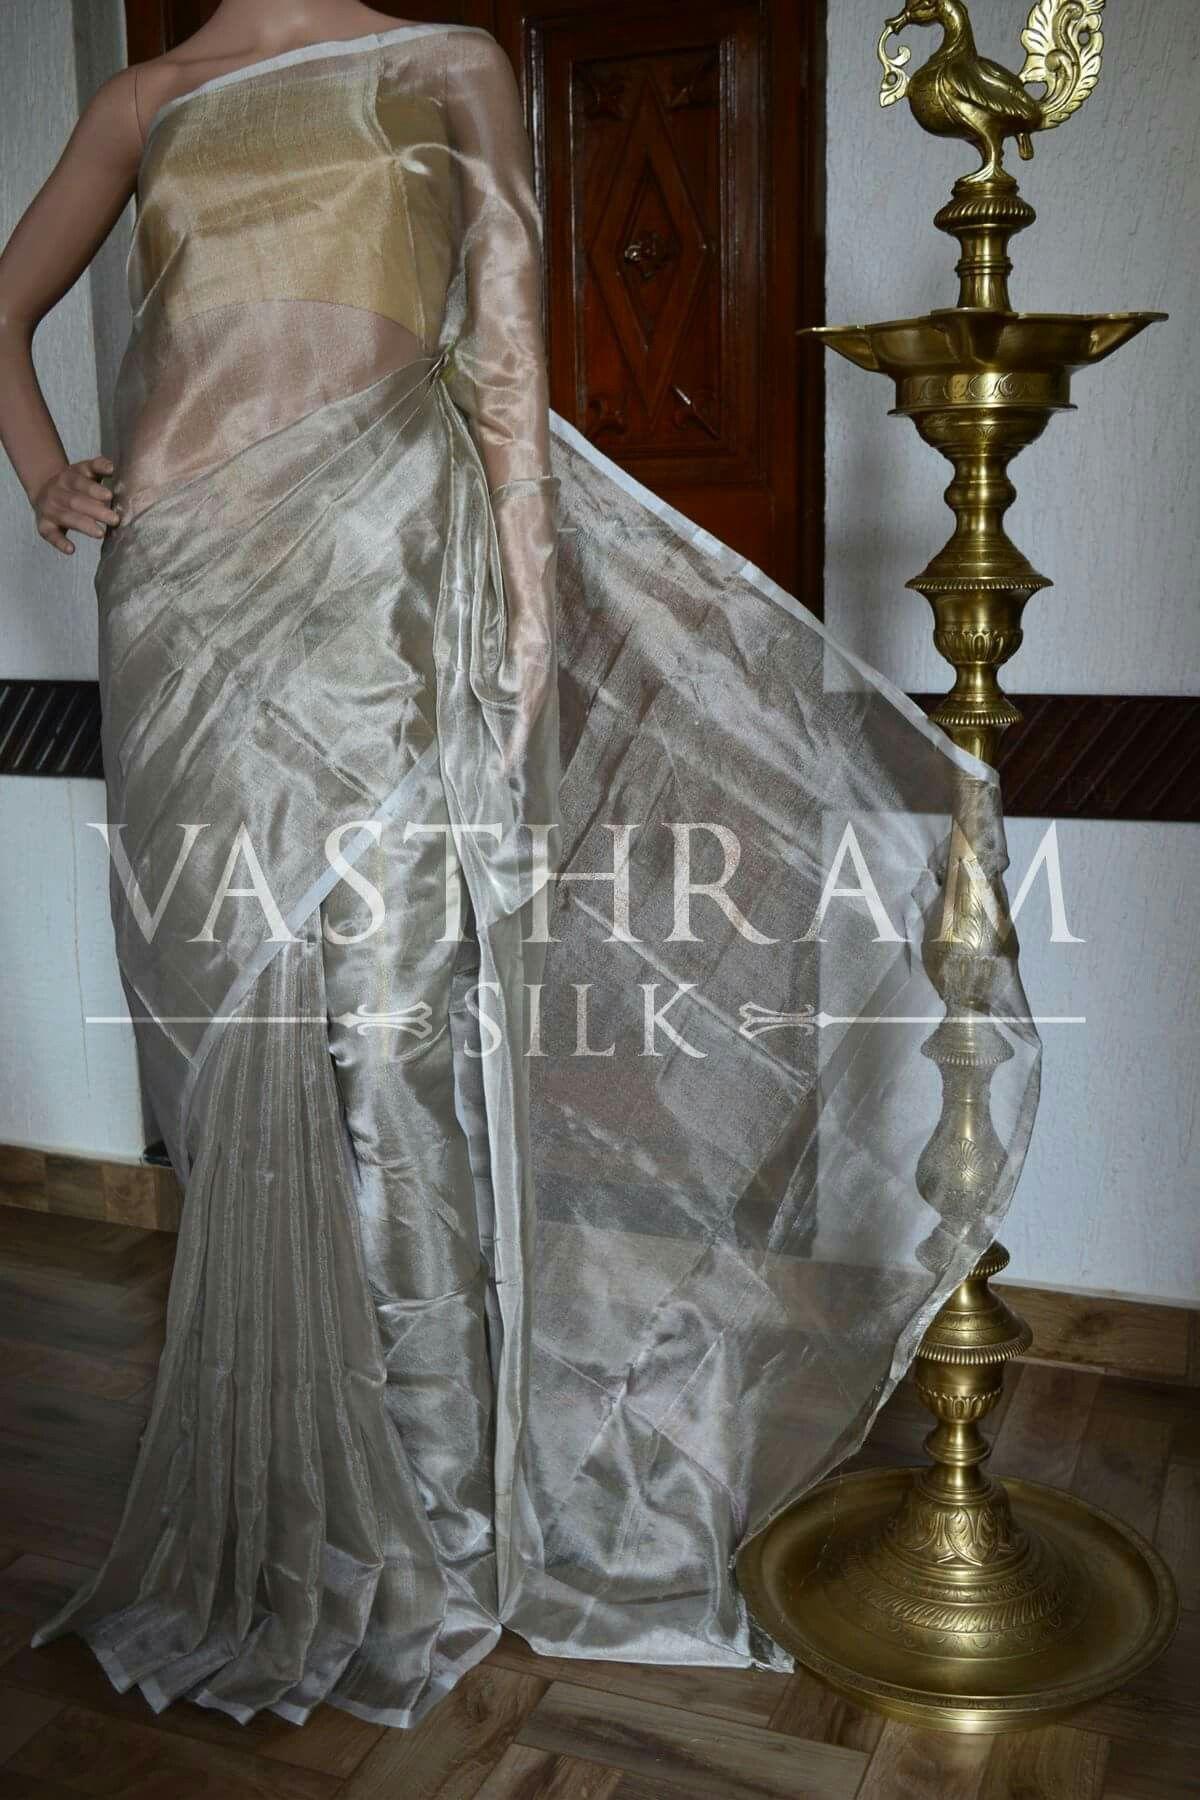 Tissue silk saree tissue uppada silk saree codejus cost inr weight